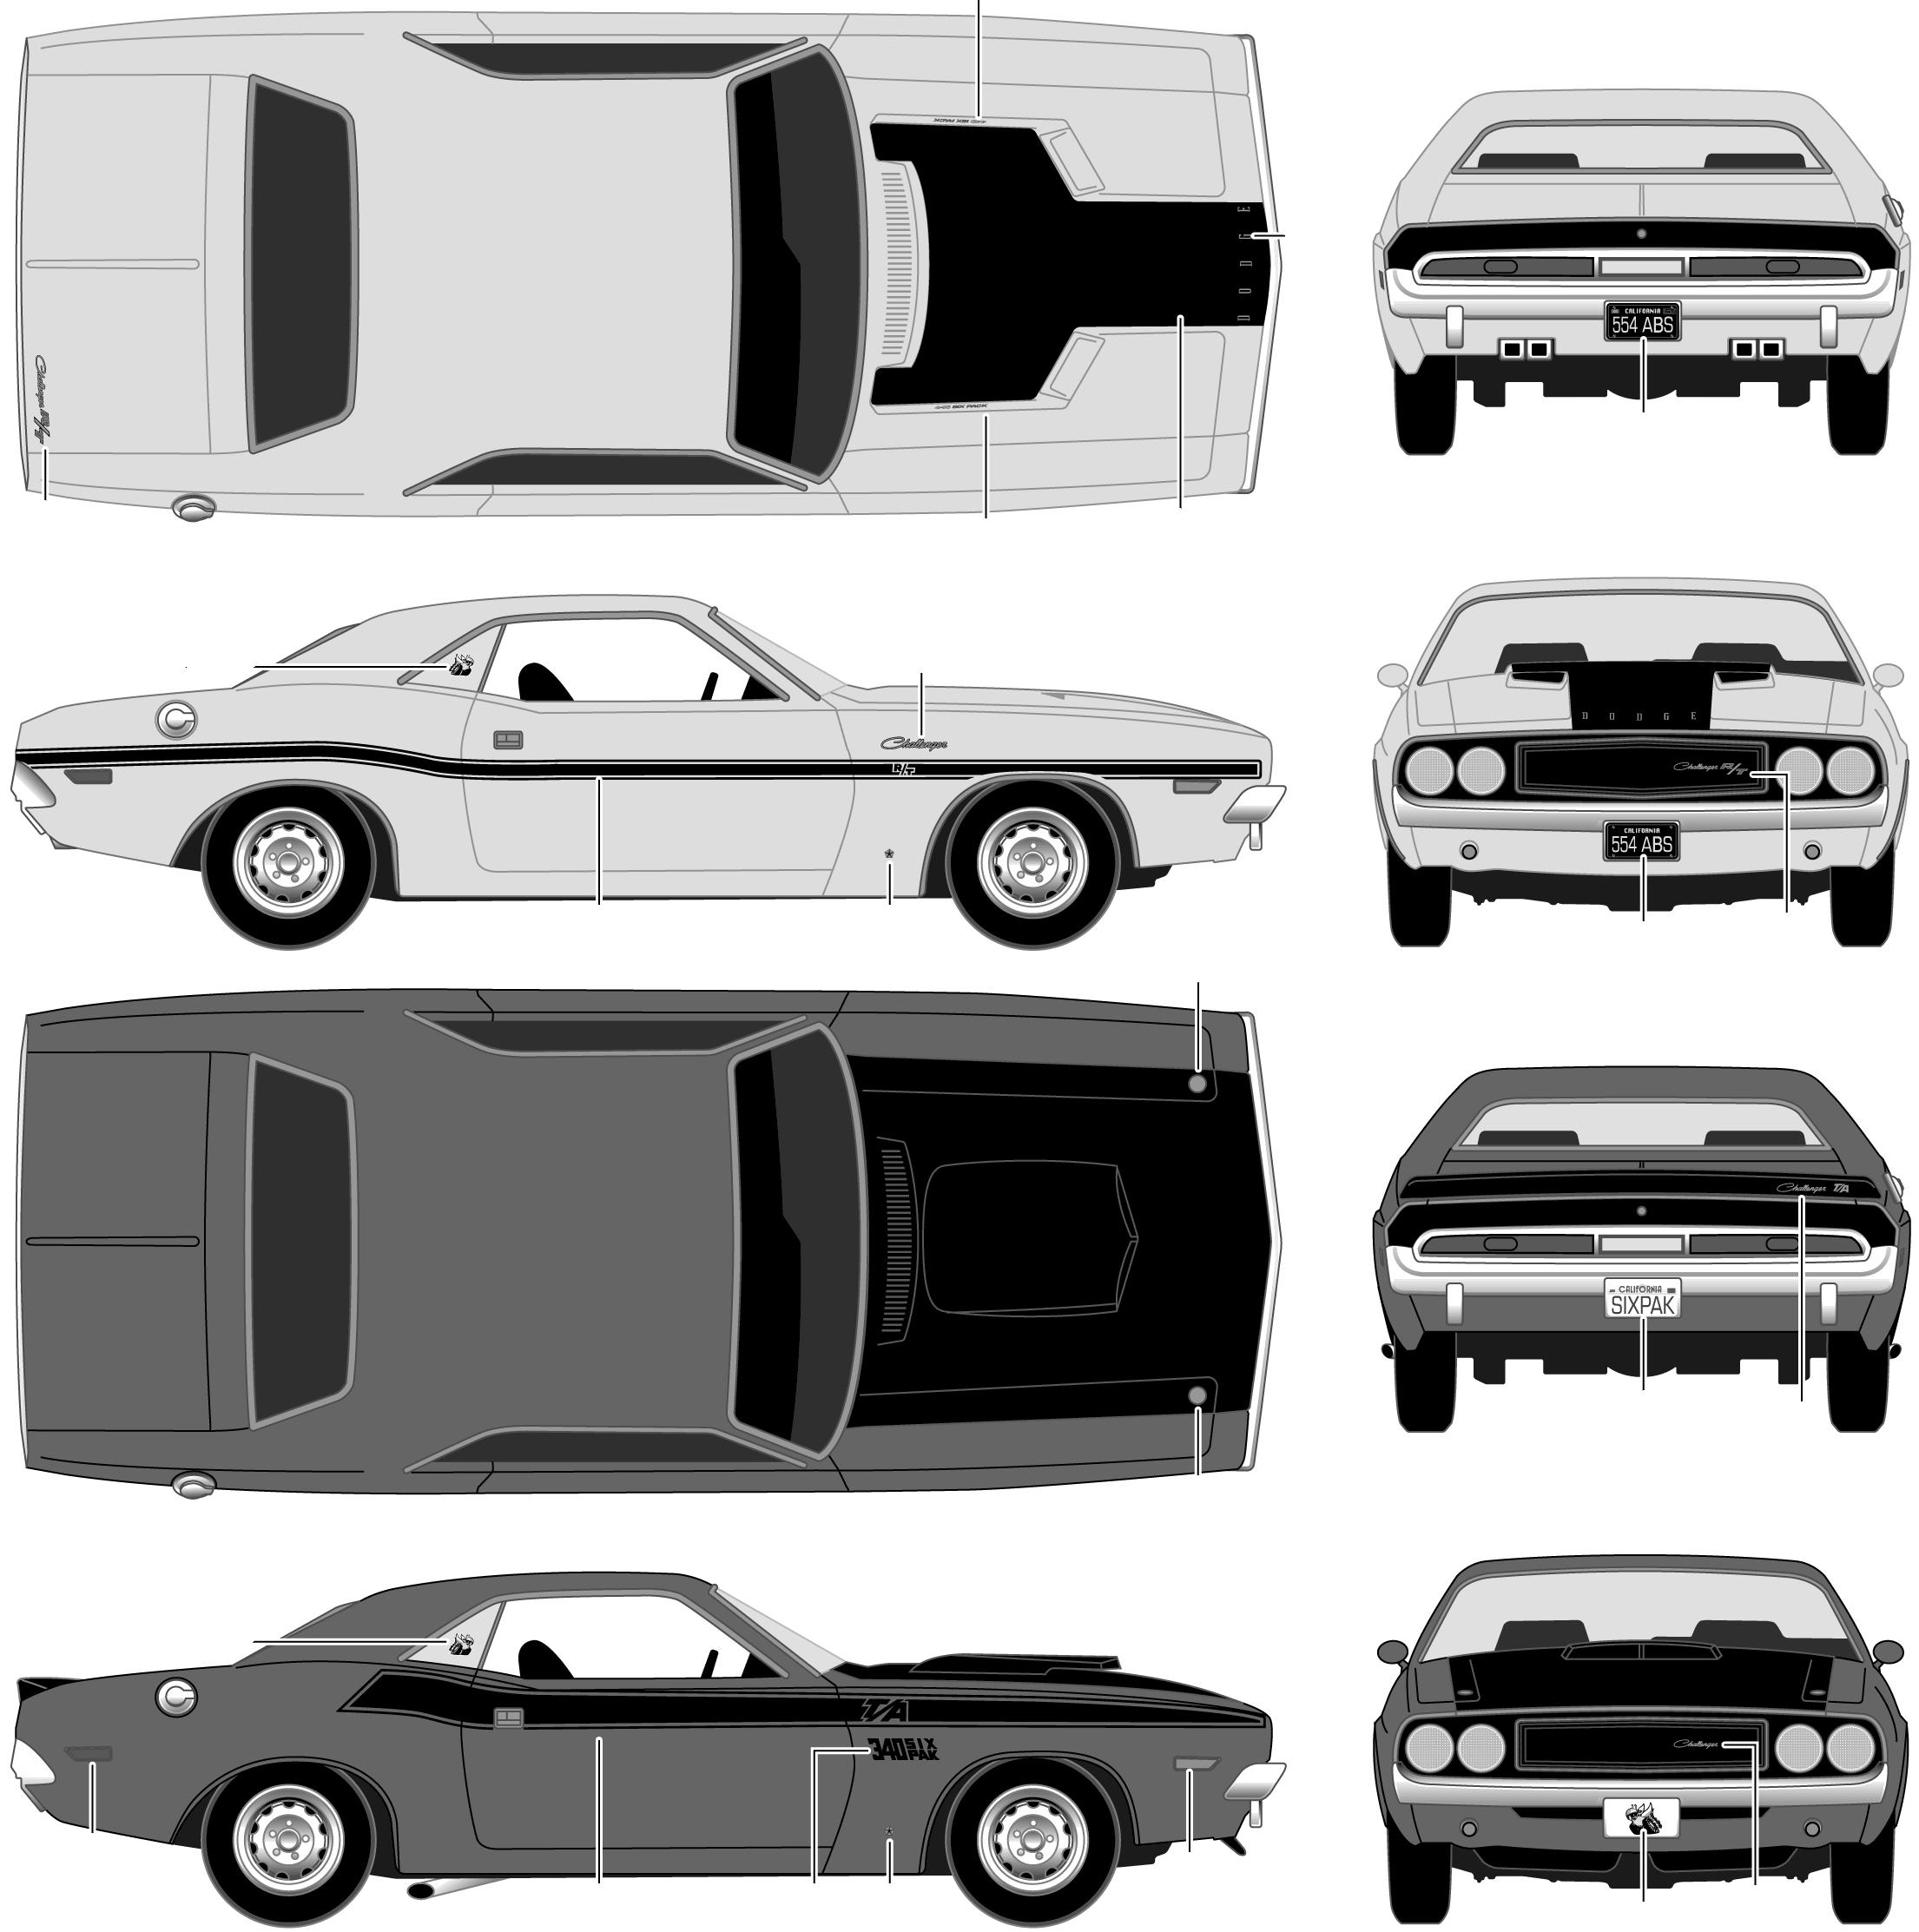 1970 Dodge Challenger Coupe blueprint.